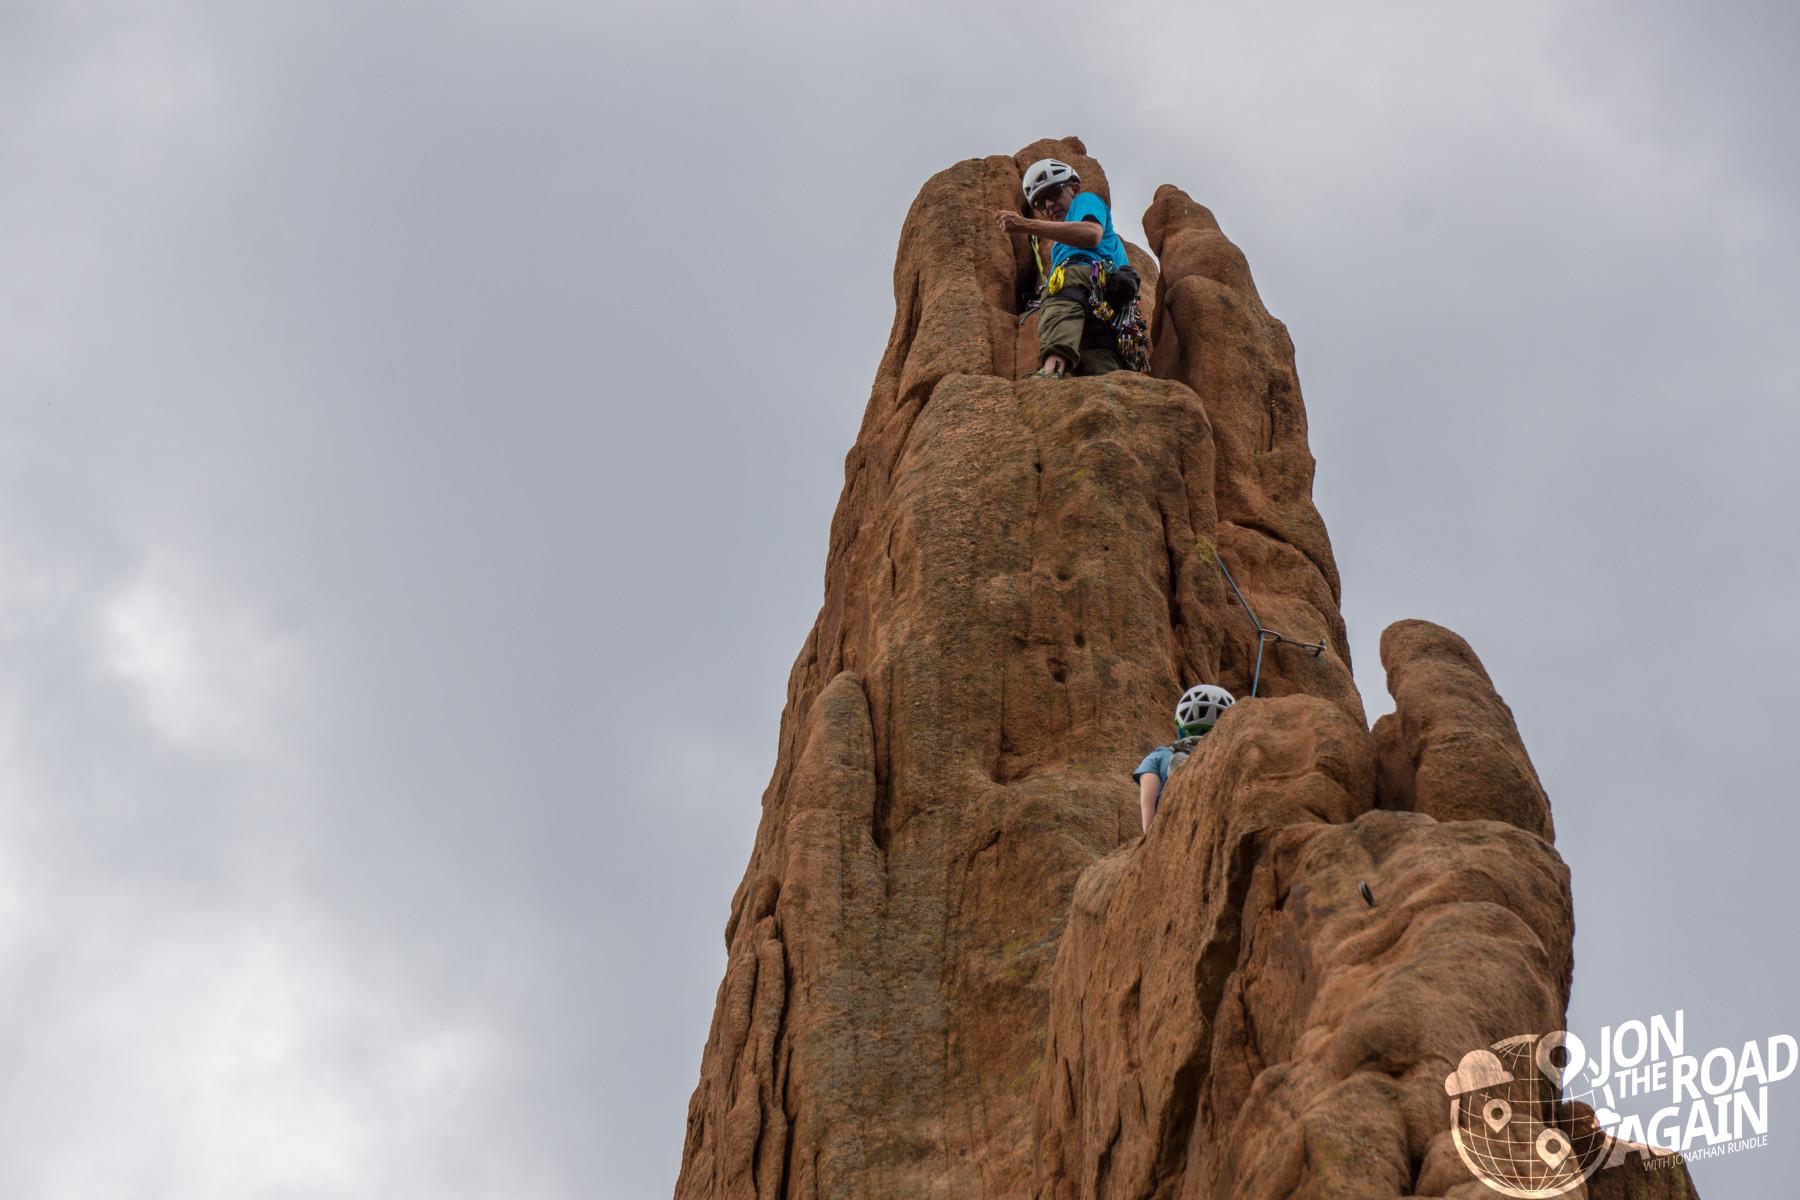 Garden of the Gods rock climbers